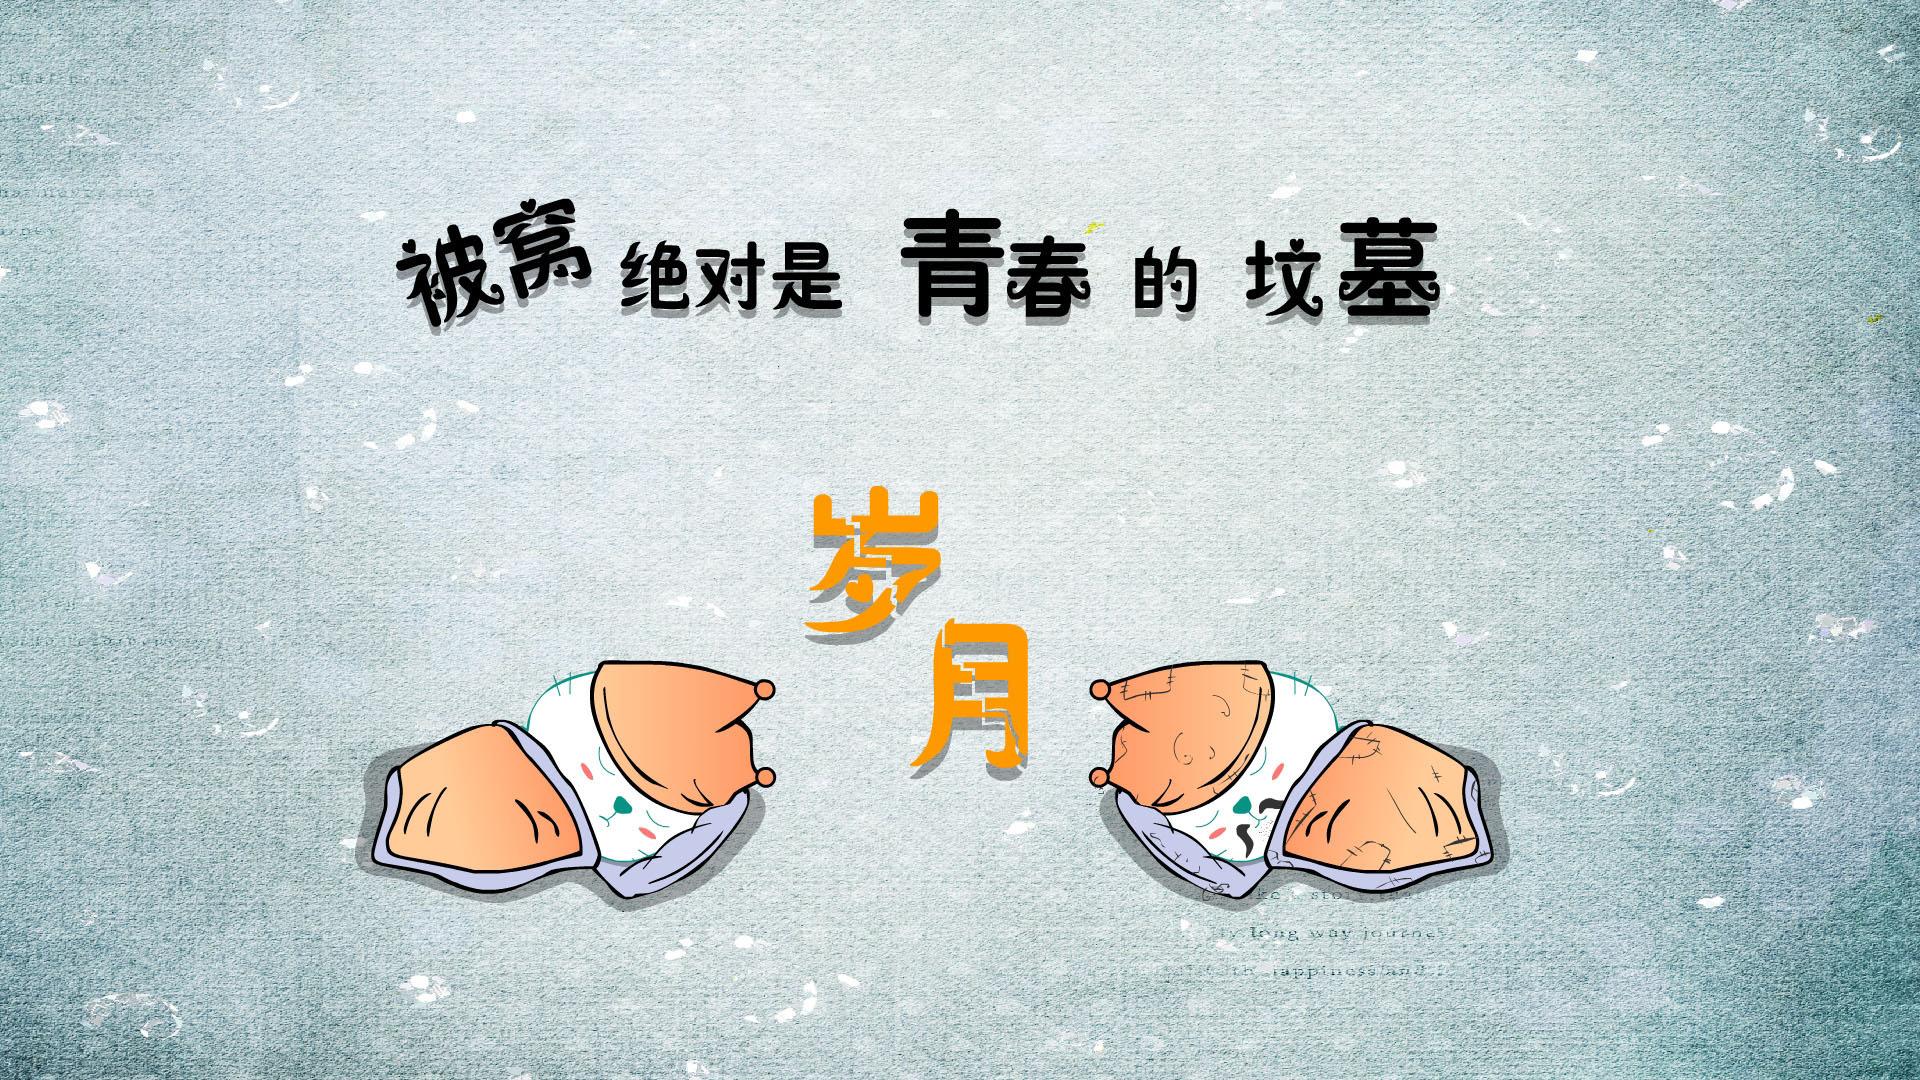 Hexo博客butterfly主题美化之新增看板娘(能说话、能换装)